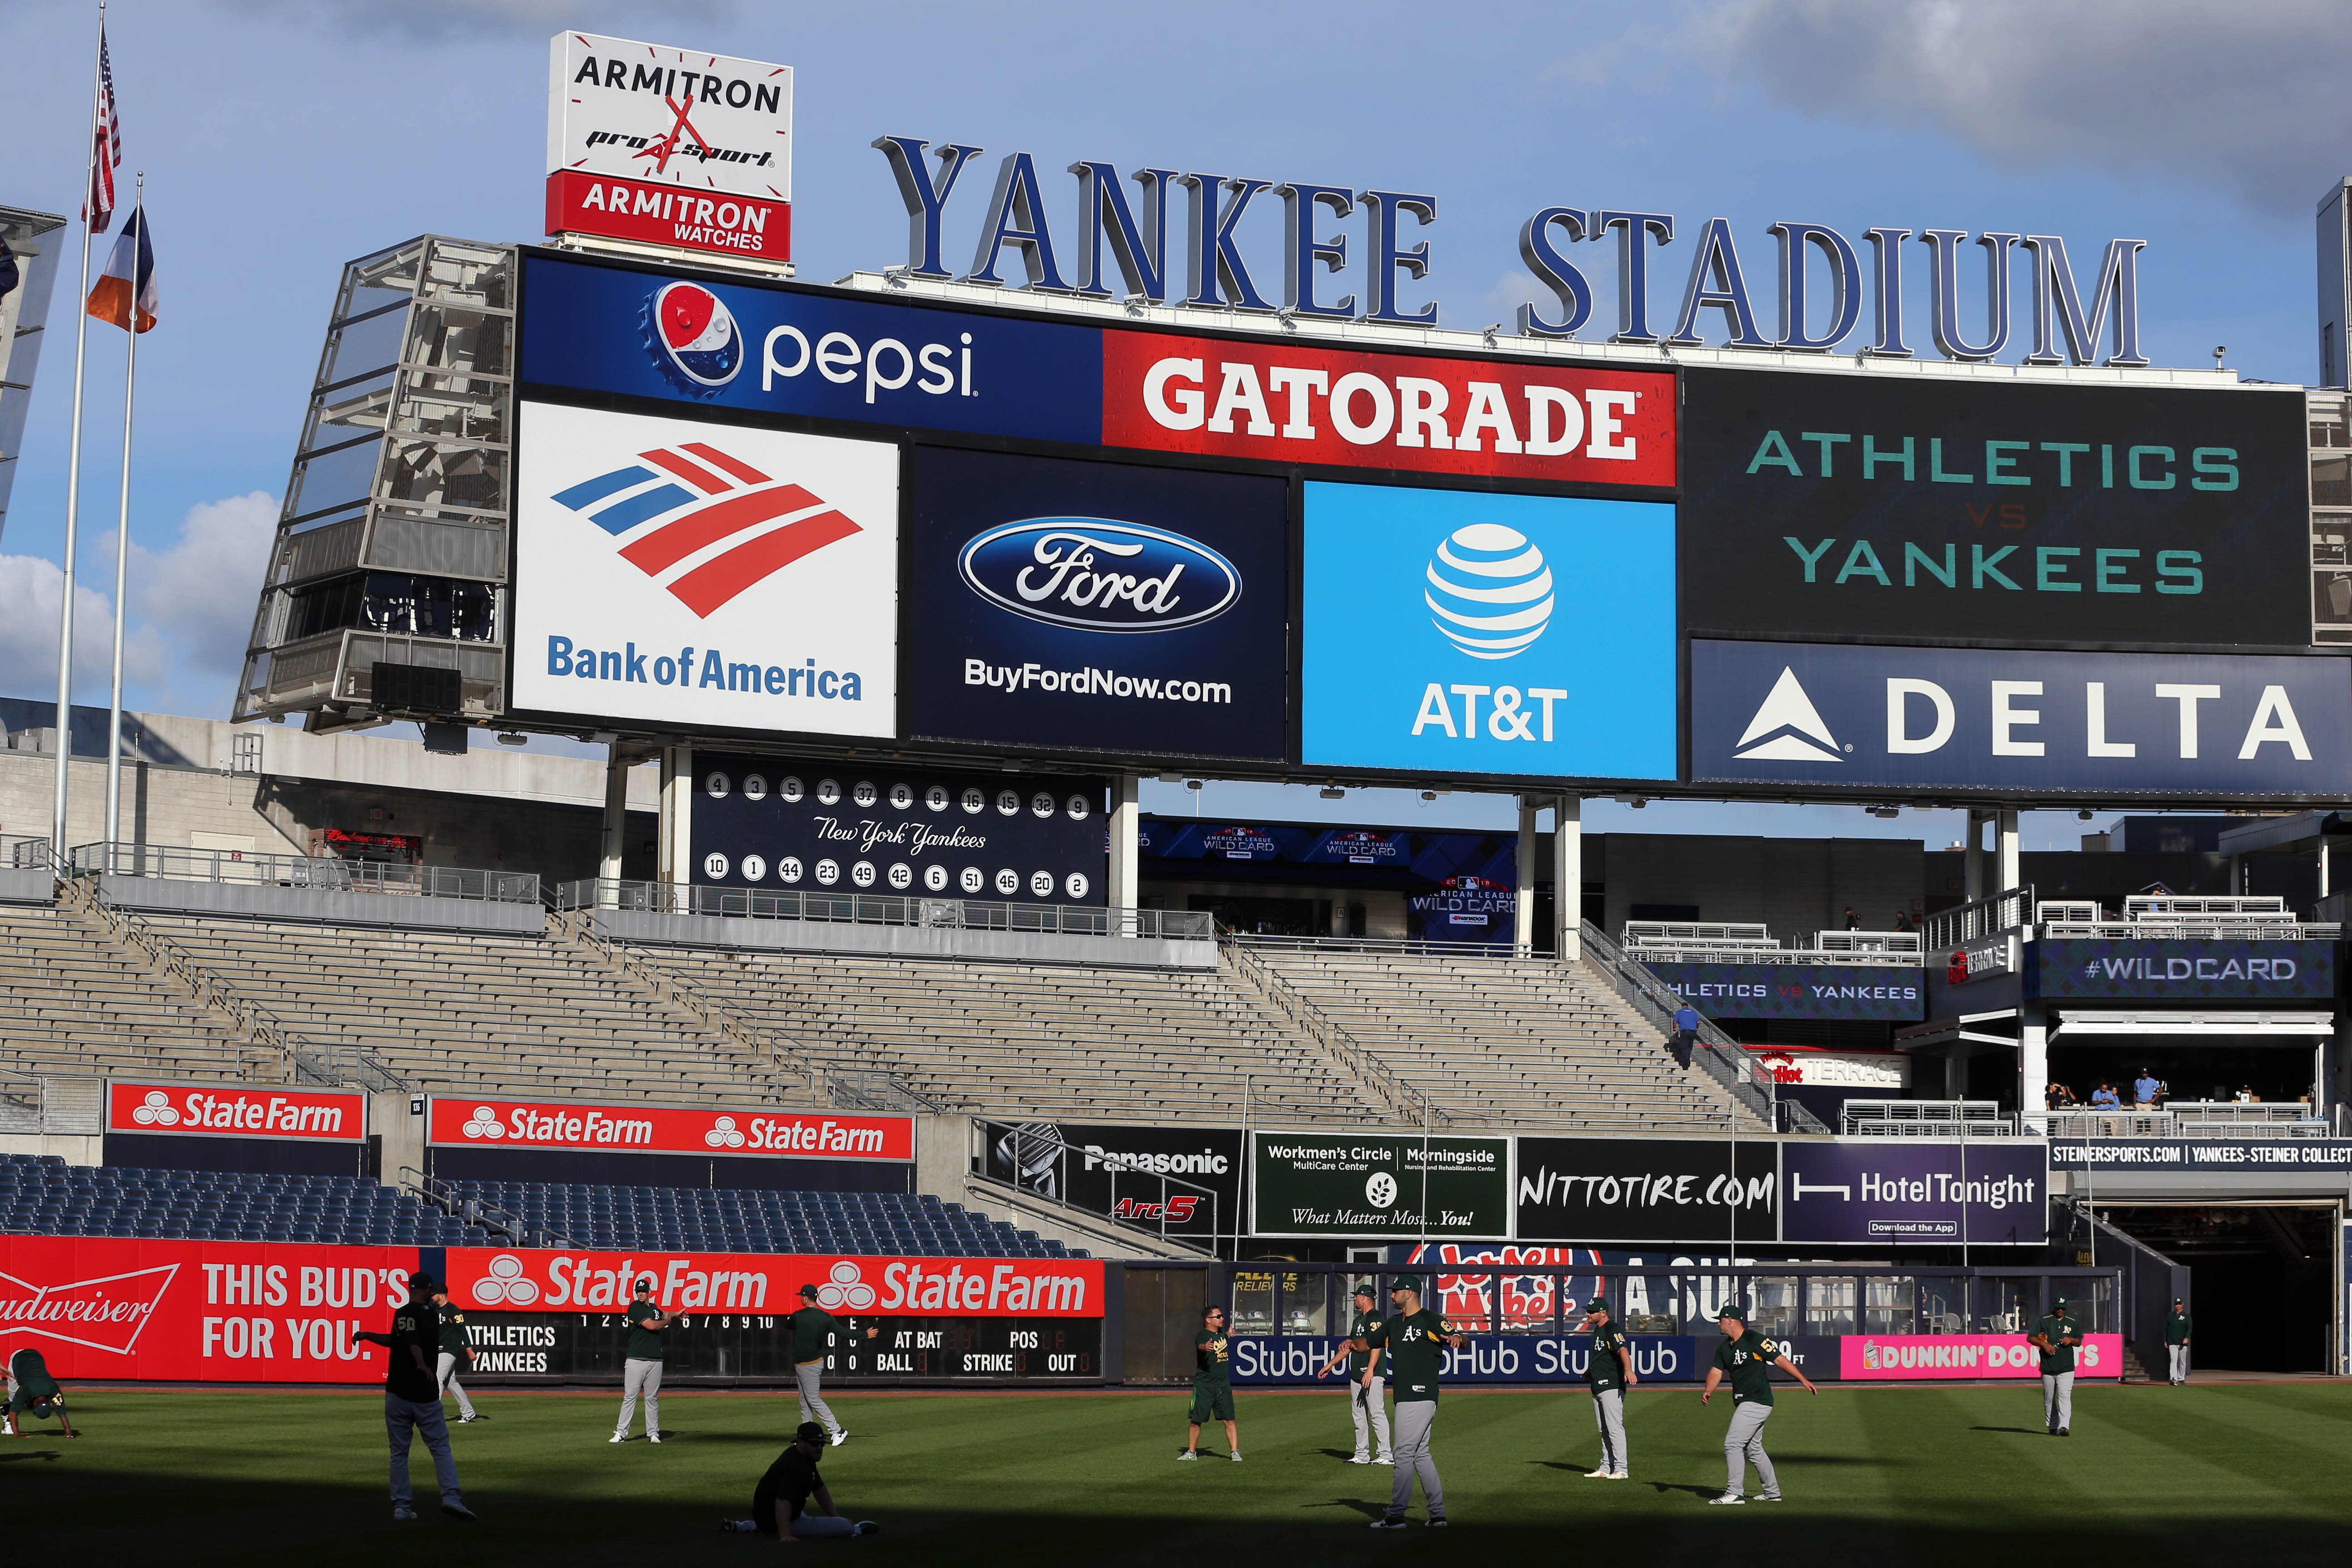 MLB: AL Wild Card-Oakland Athletics at New York Yankees